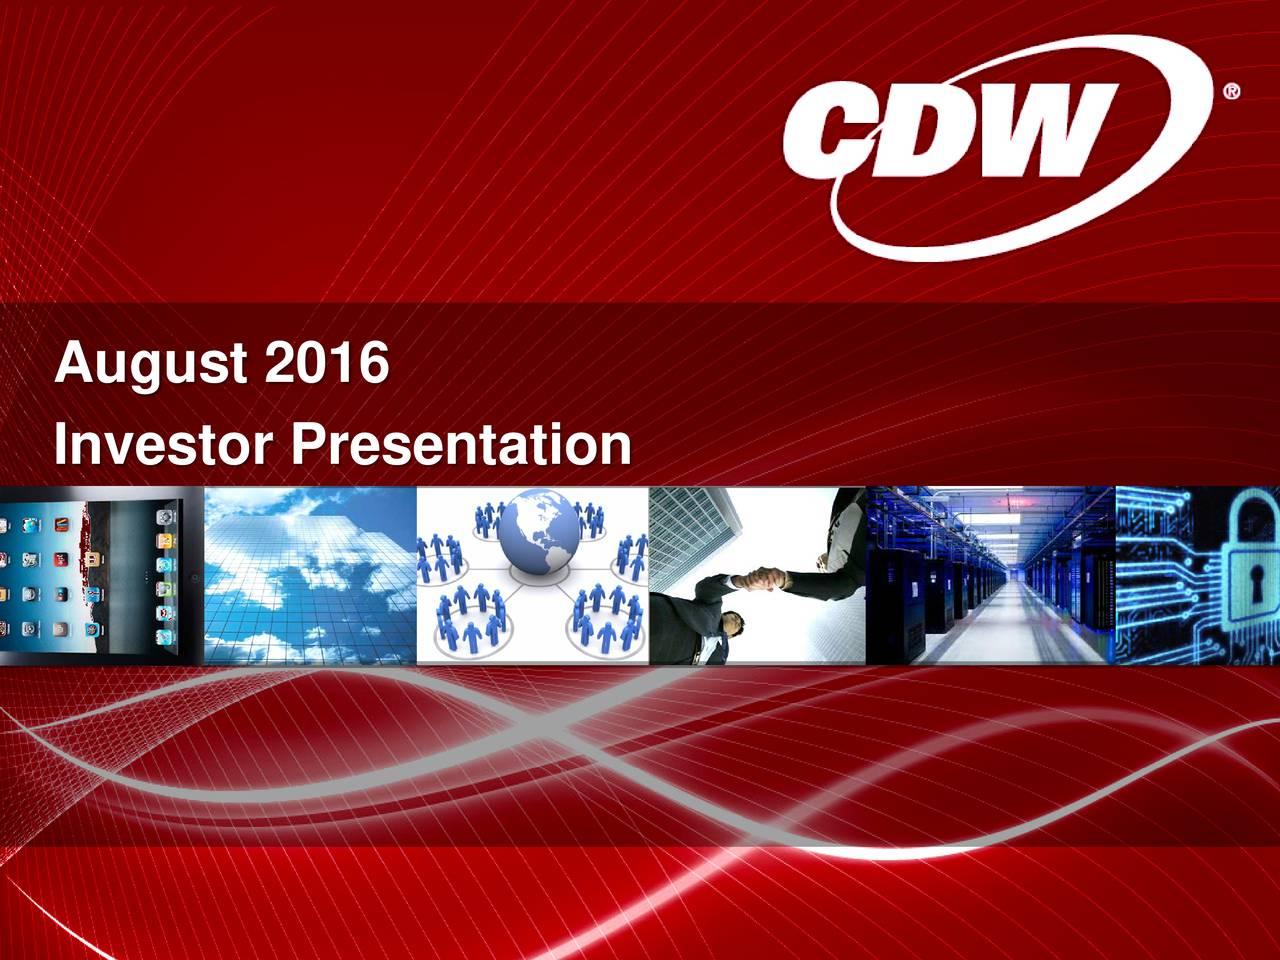 August 2016 Investor Presentation 2012 CDW Corporation